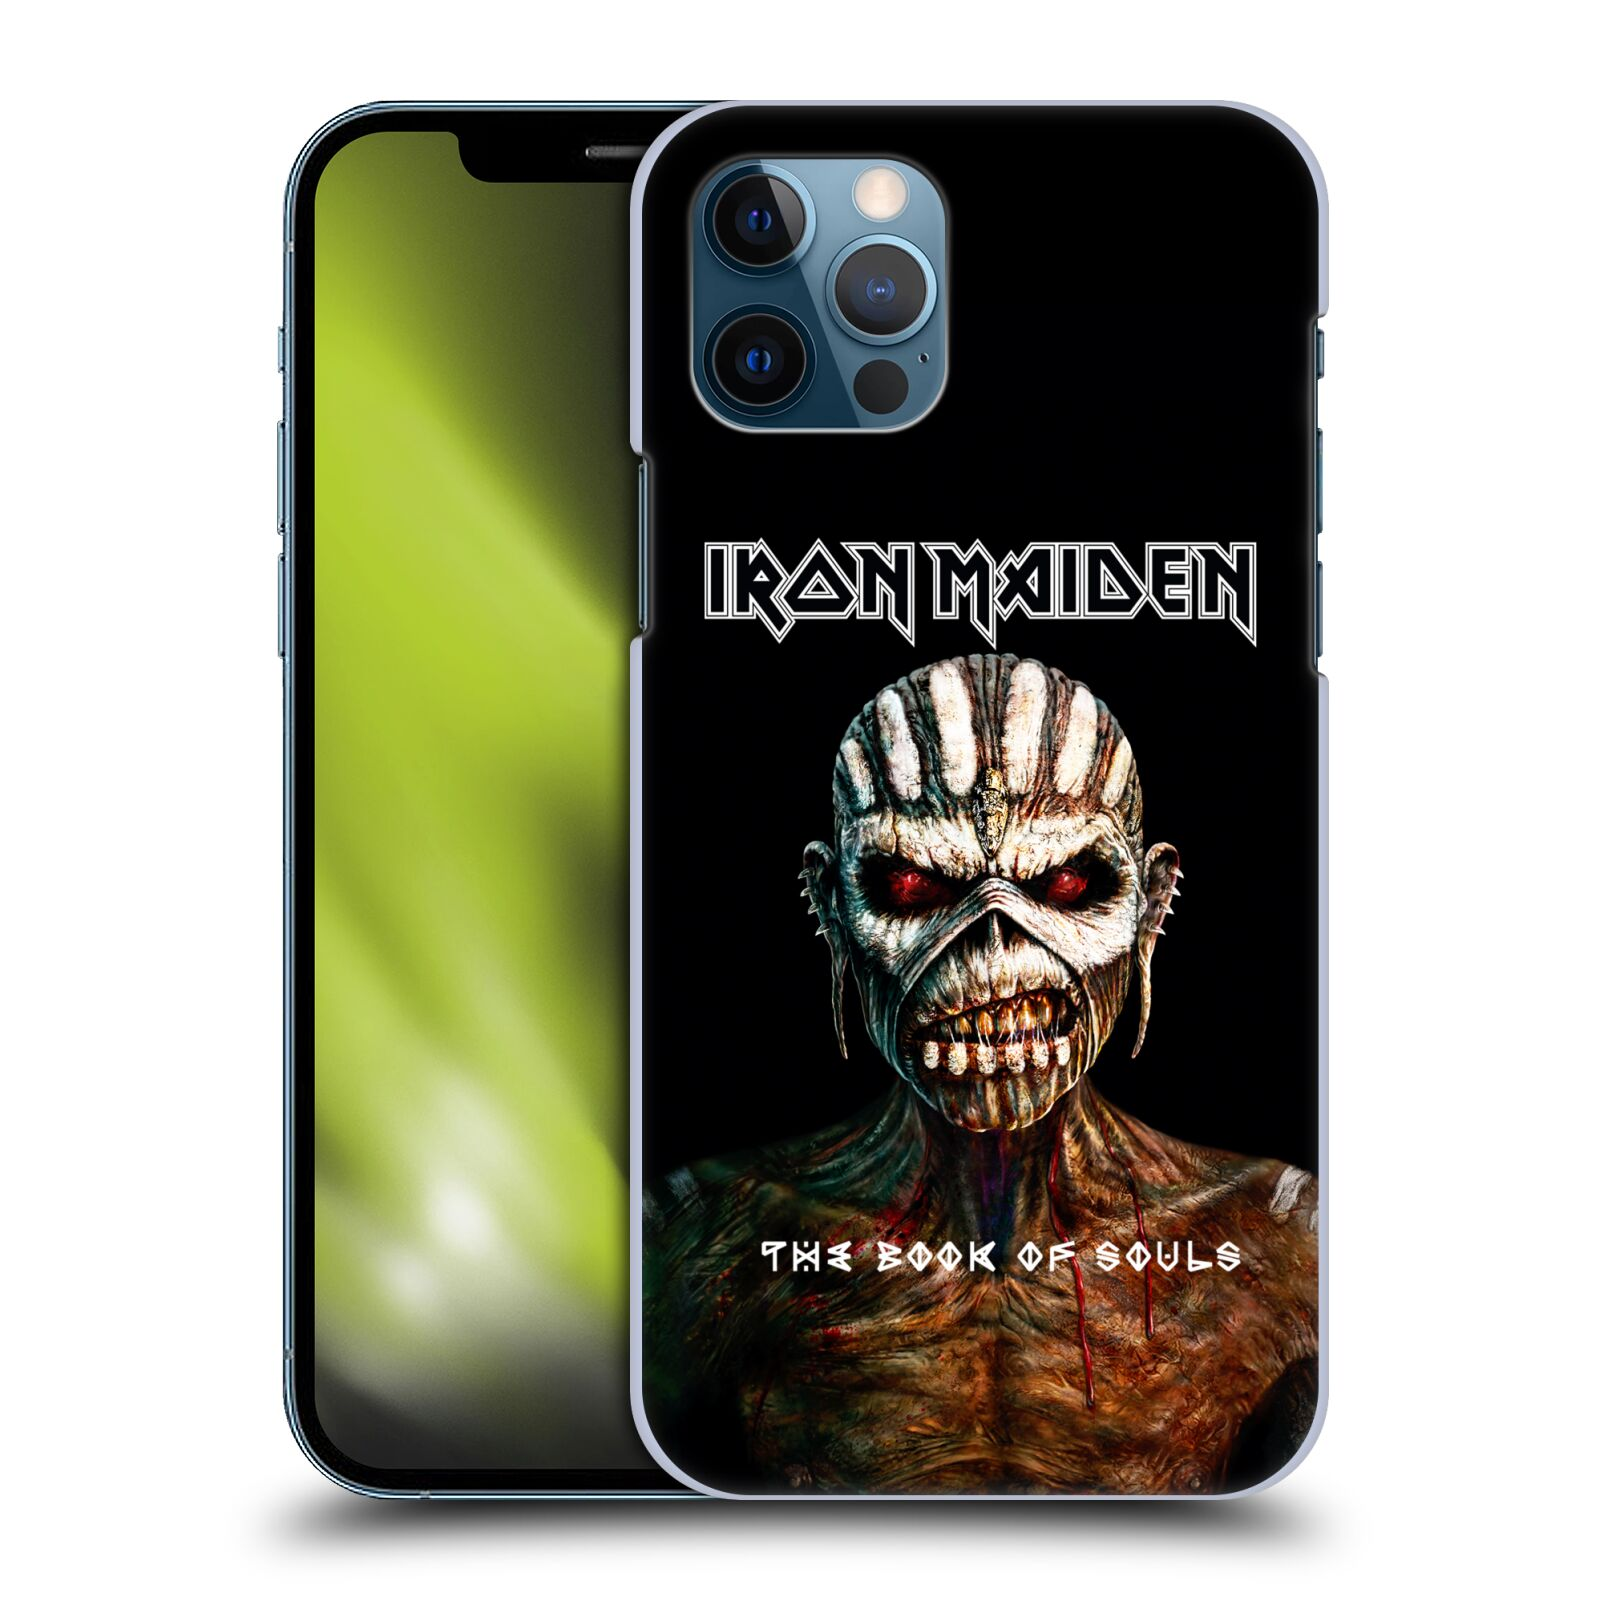 Plastové pouzdro na mobil Apple iPhone 12 / 12 Pro - Head Case - Iron Maiden - The Book Of Souls